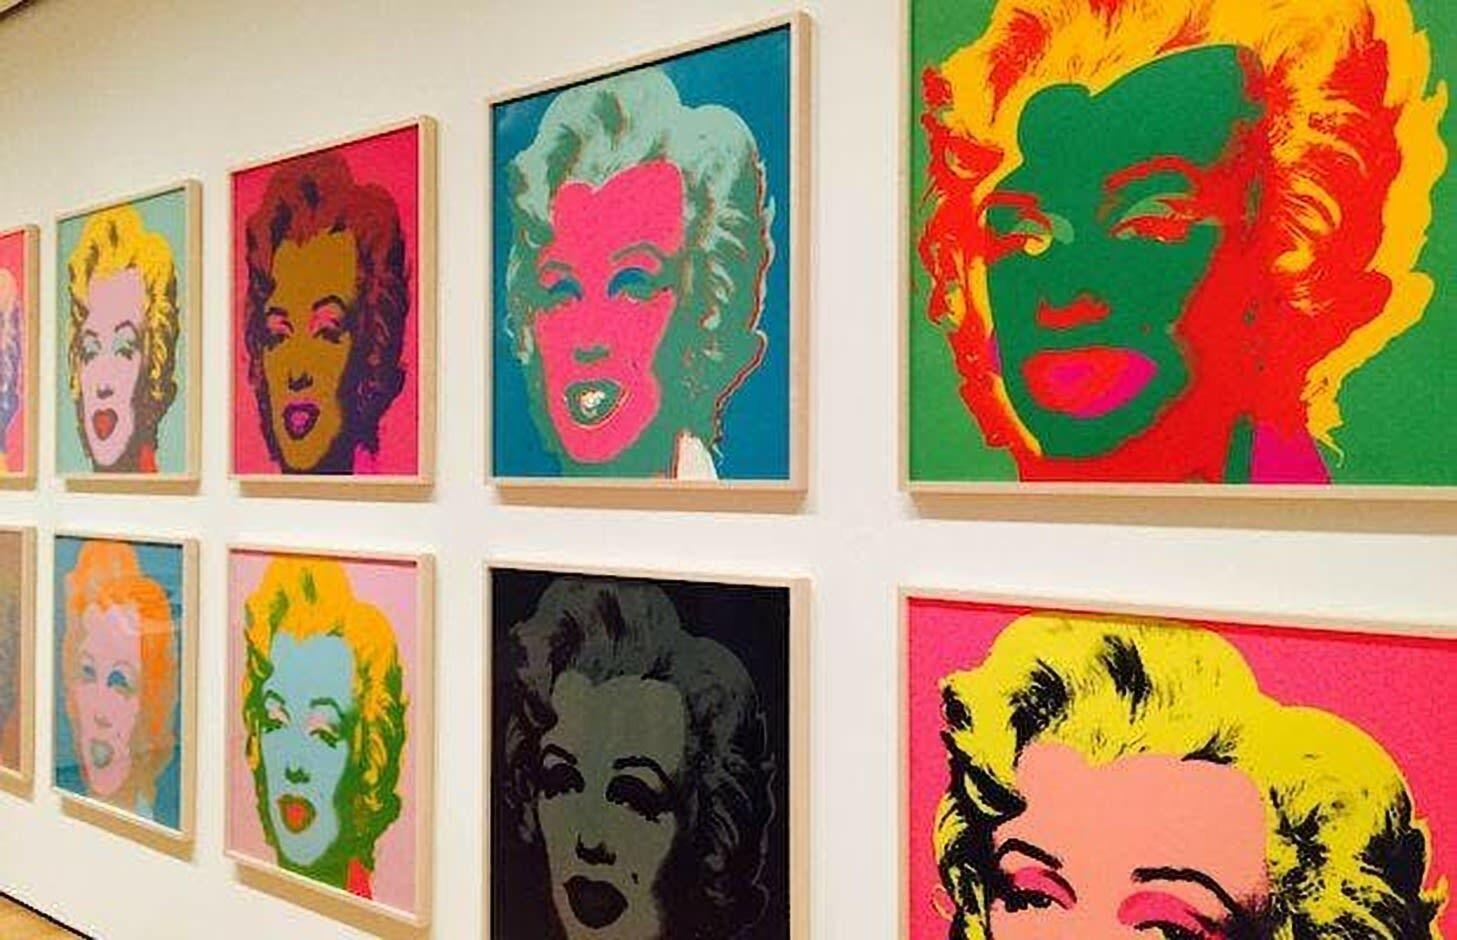 Scavenger Hunt at MoMA & Pub Meet-Up